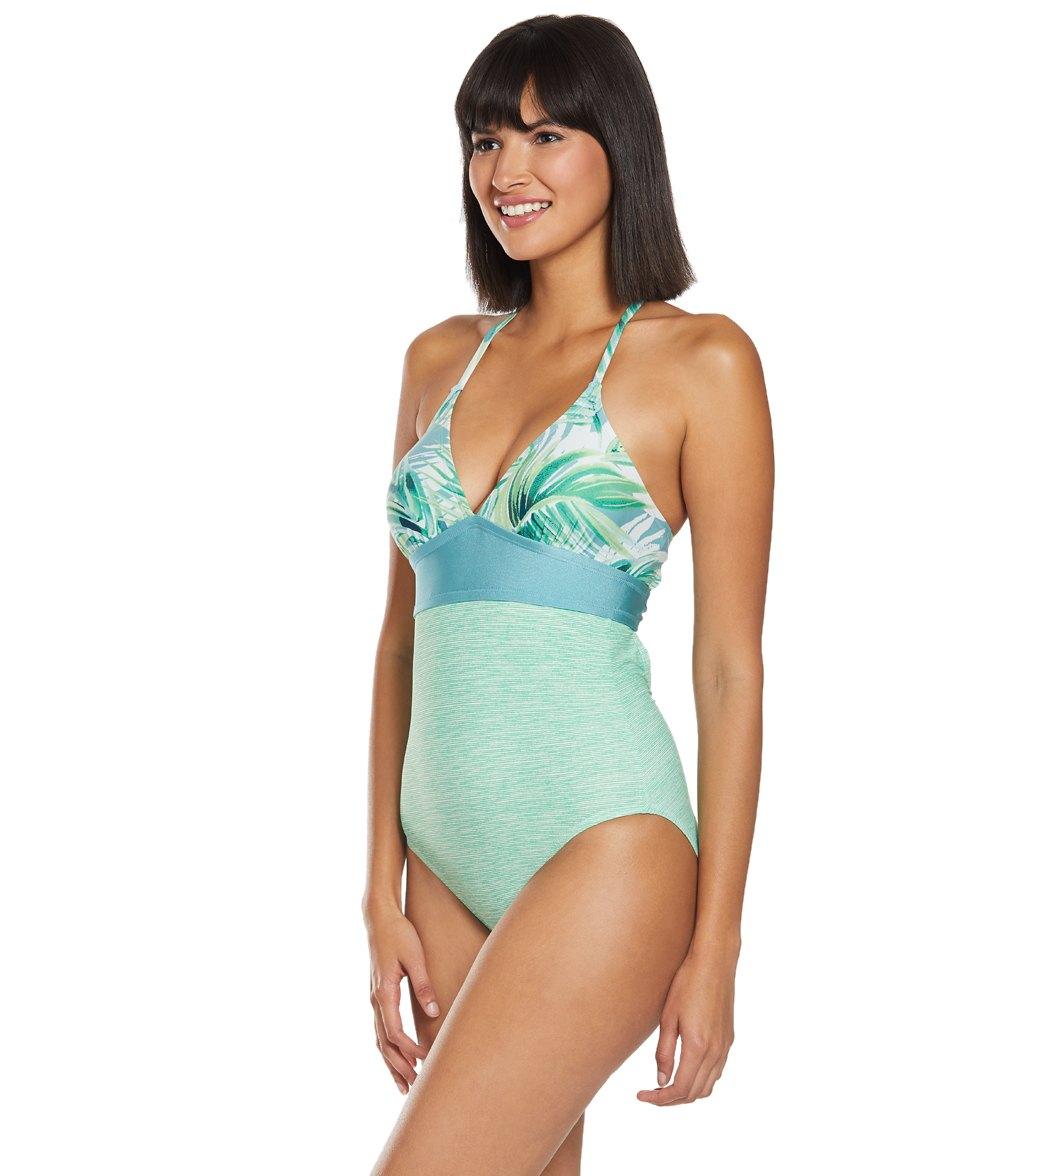 62a02ec18cbea Carve Designs Dahlia One Piece Swimsuit at SwimOutlet.com - Free ...